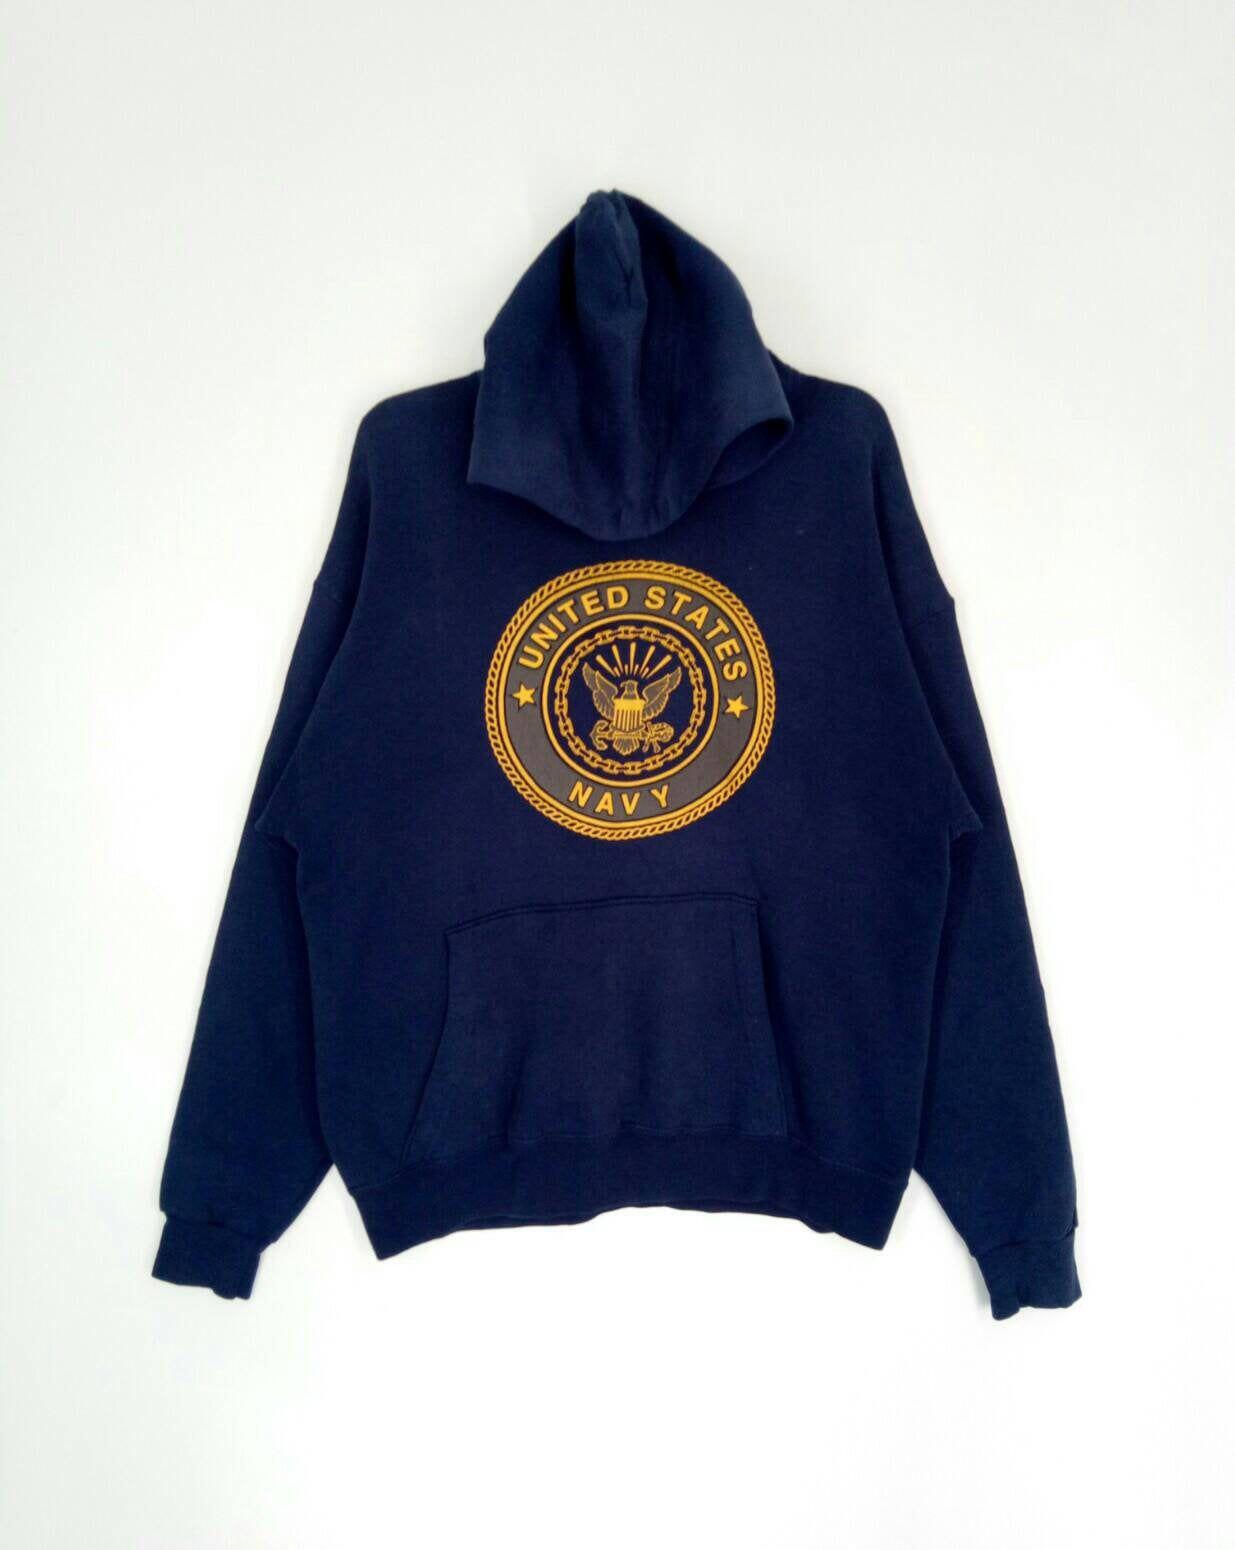 Rare United States Navy Hoodies Nice Design Large Size Etsy Navy Hoodie Used Clothing Hoodies [ 1550 x 1235 Pixel ]